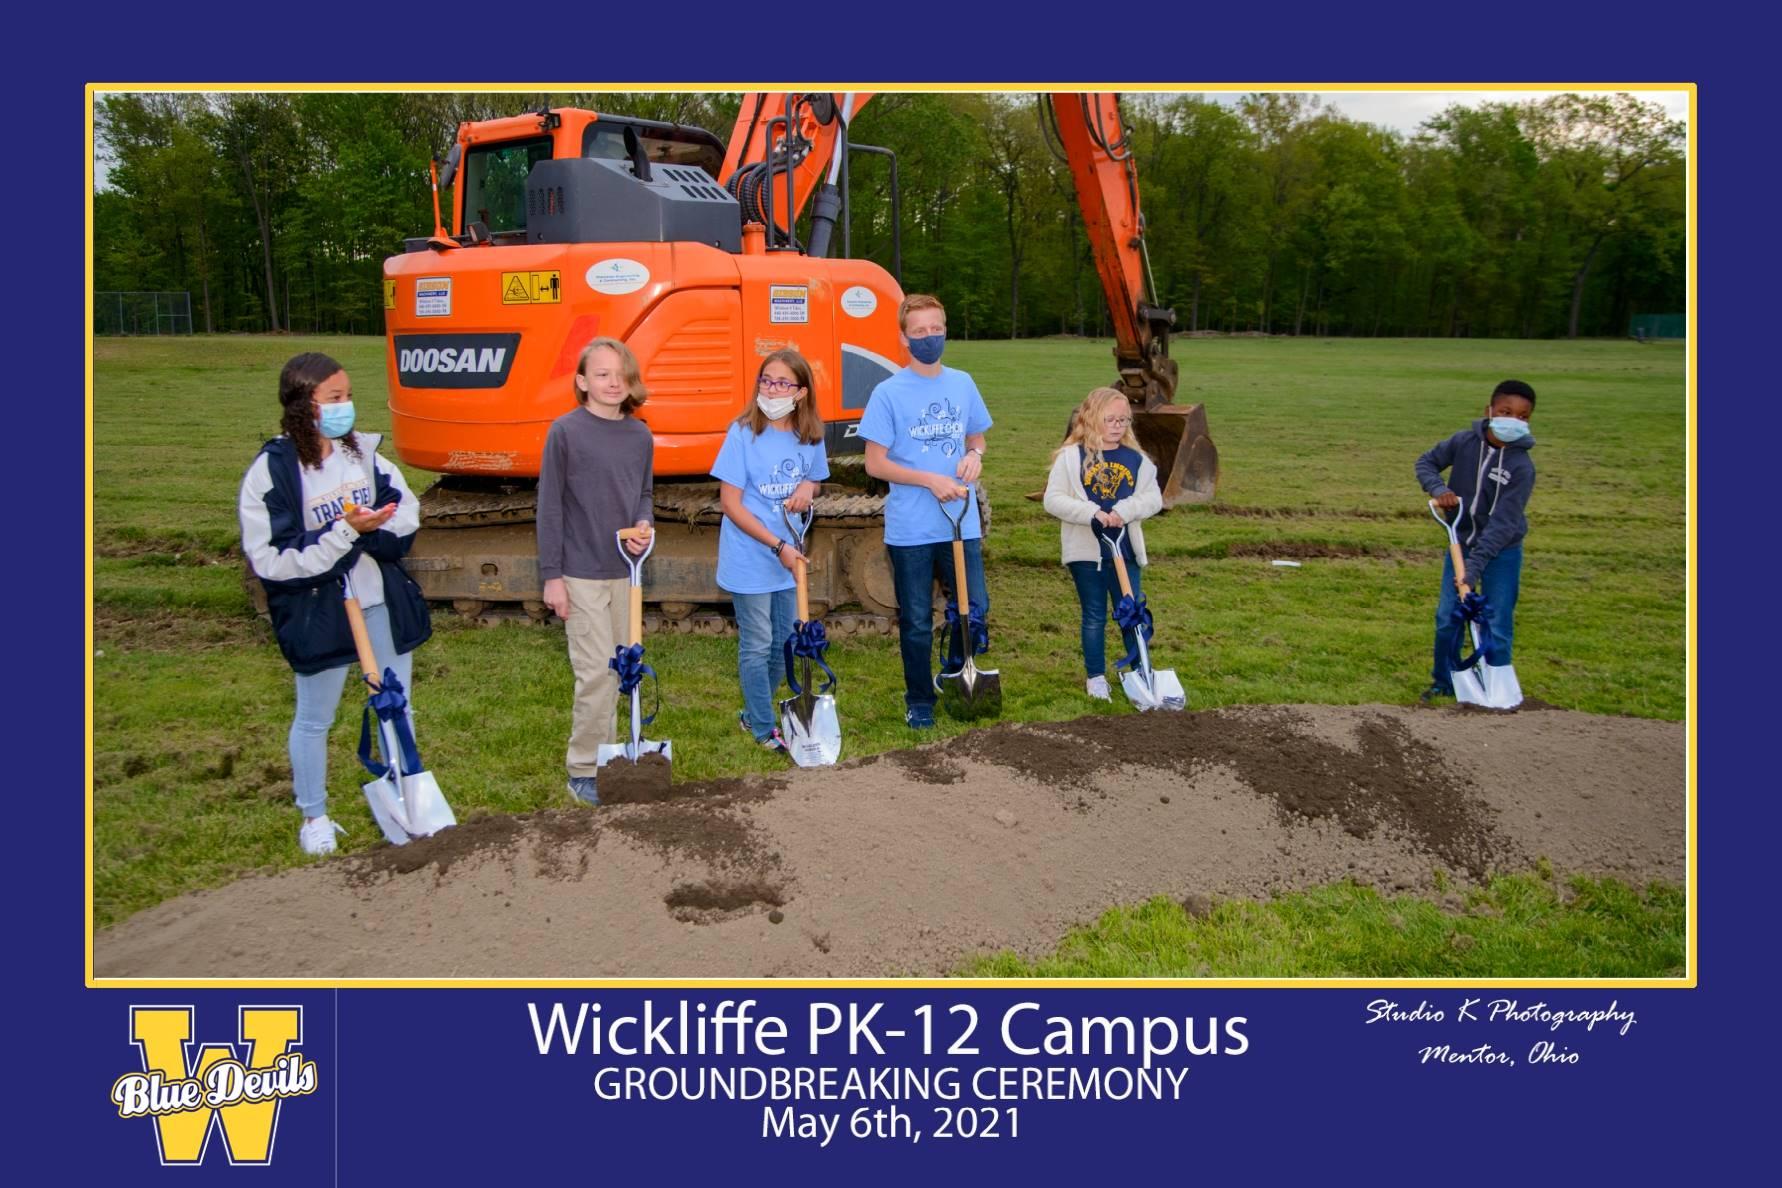 Wickliffe Students Breaking Ground